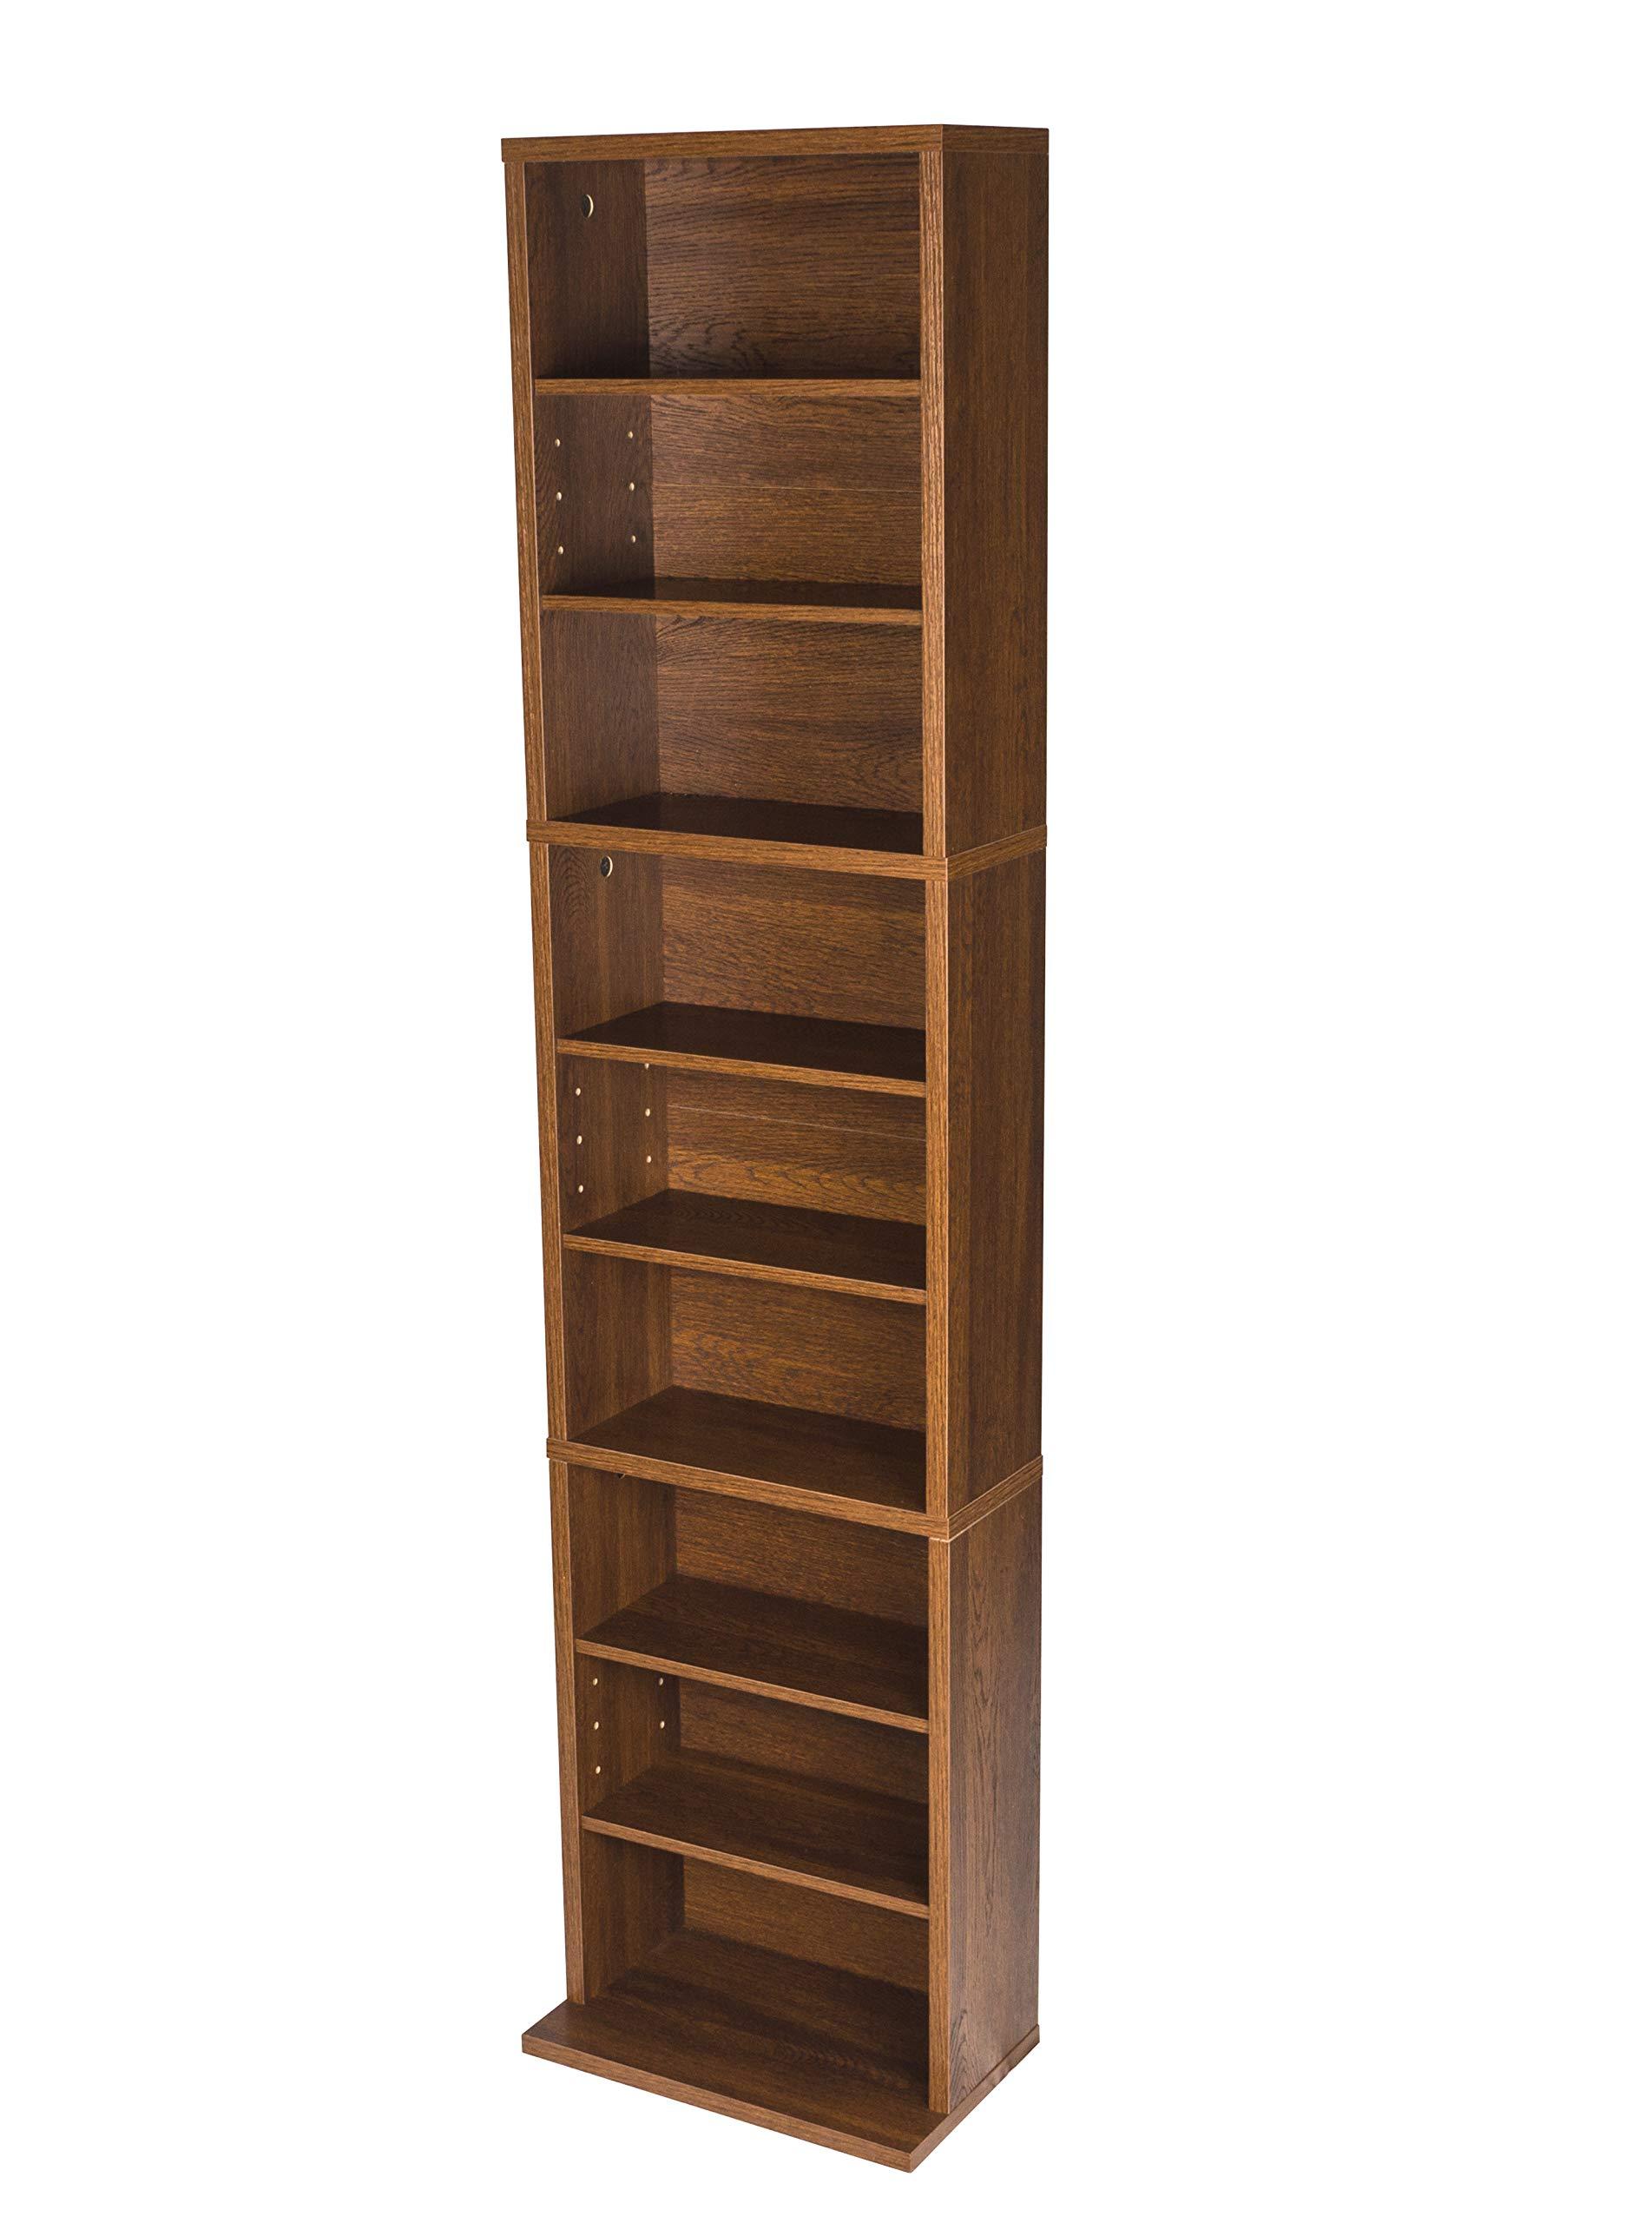 Atlantic Herrin Adjustable Media Cabinet - Holds 261CD, 114DV, 132 Blu-Ray/Games PN74736249 in Textured Chestnut by Atlantic